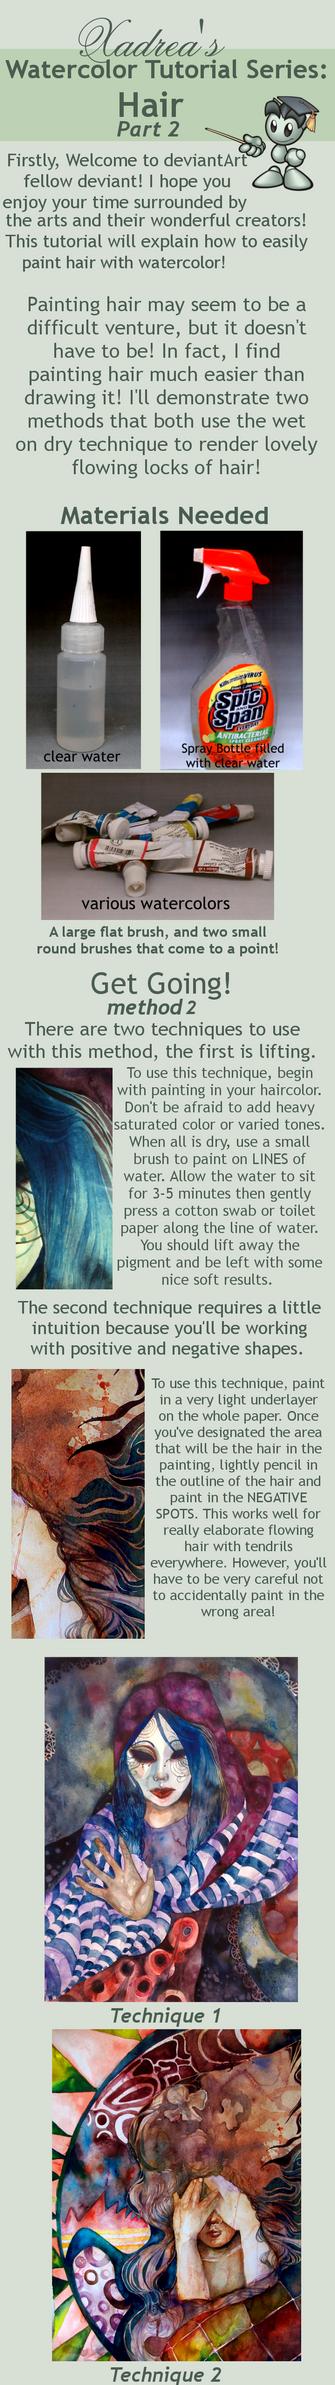 Watercolor Tutorial: Hair part 2 by Xadrea